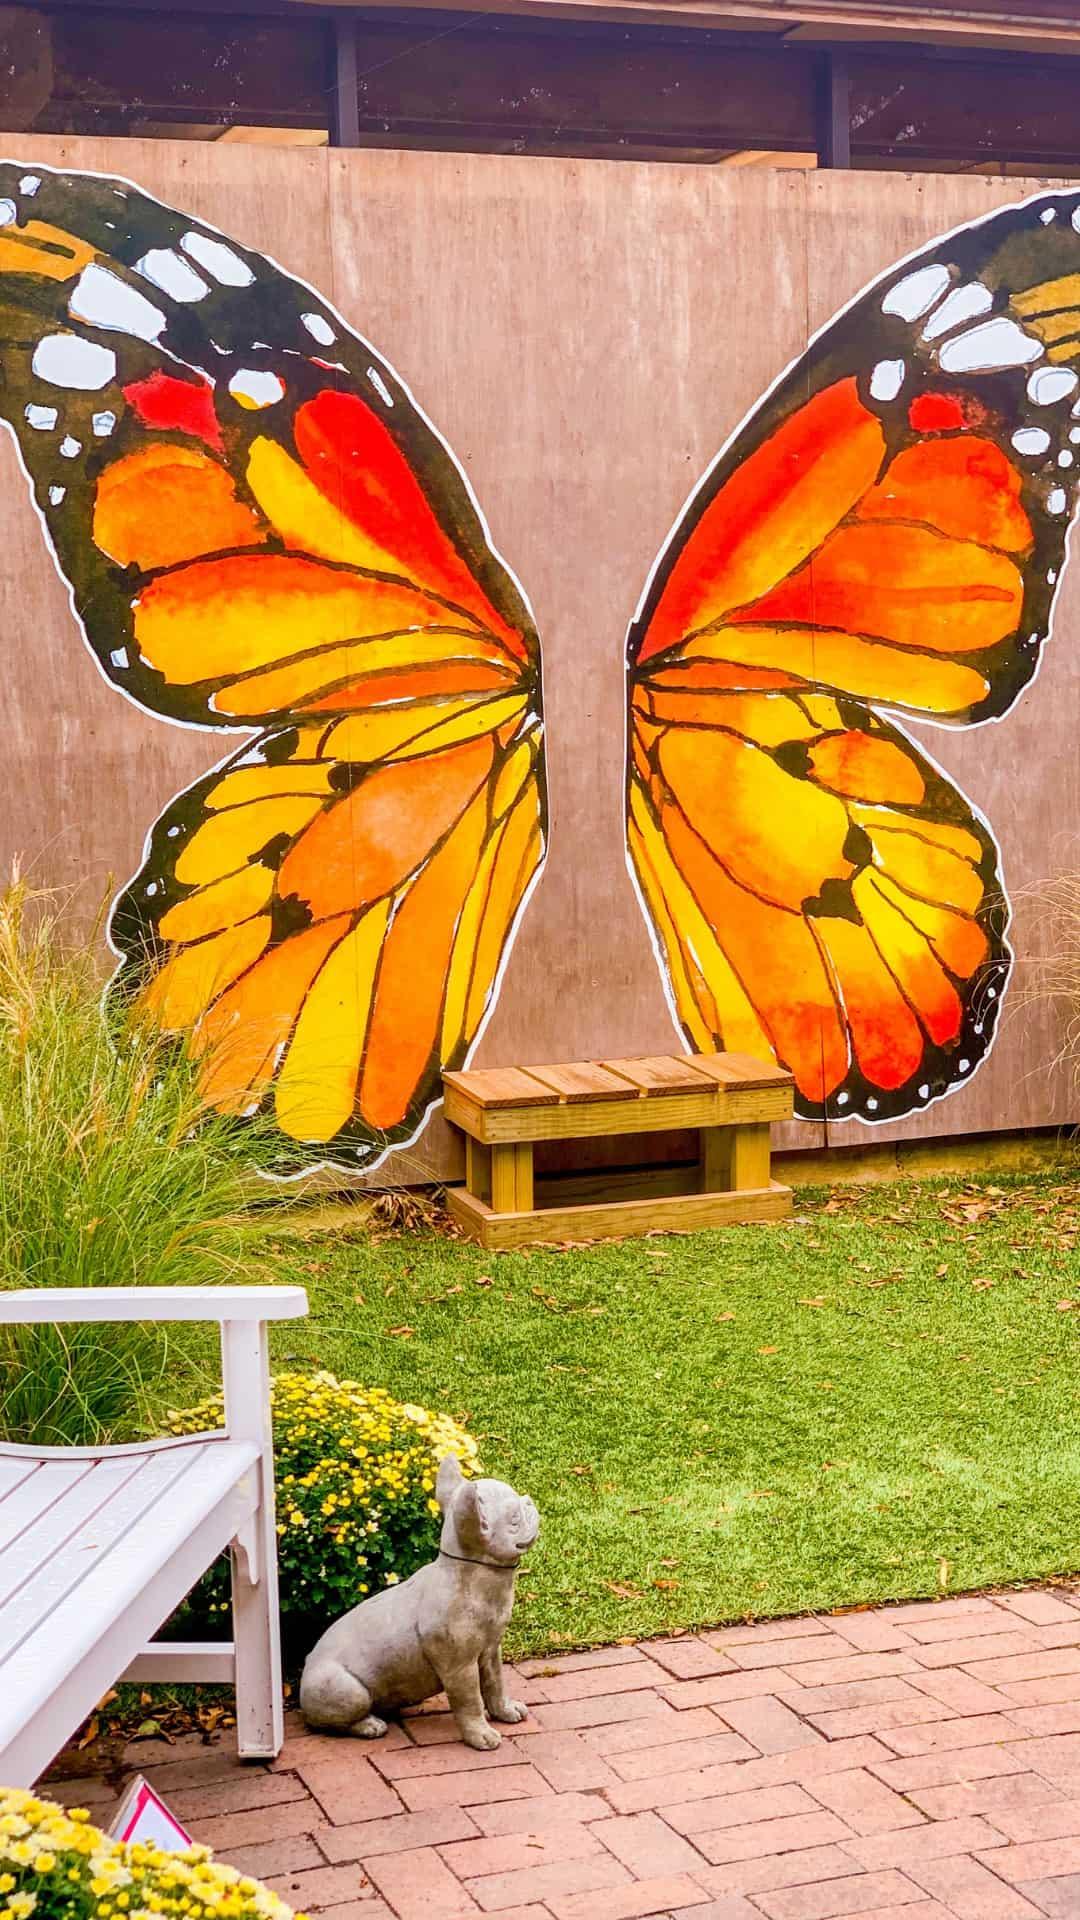 Autumn Wallpaper iPhone Aesthetic Orange Butterfly Mural